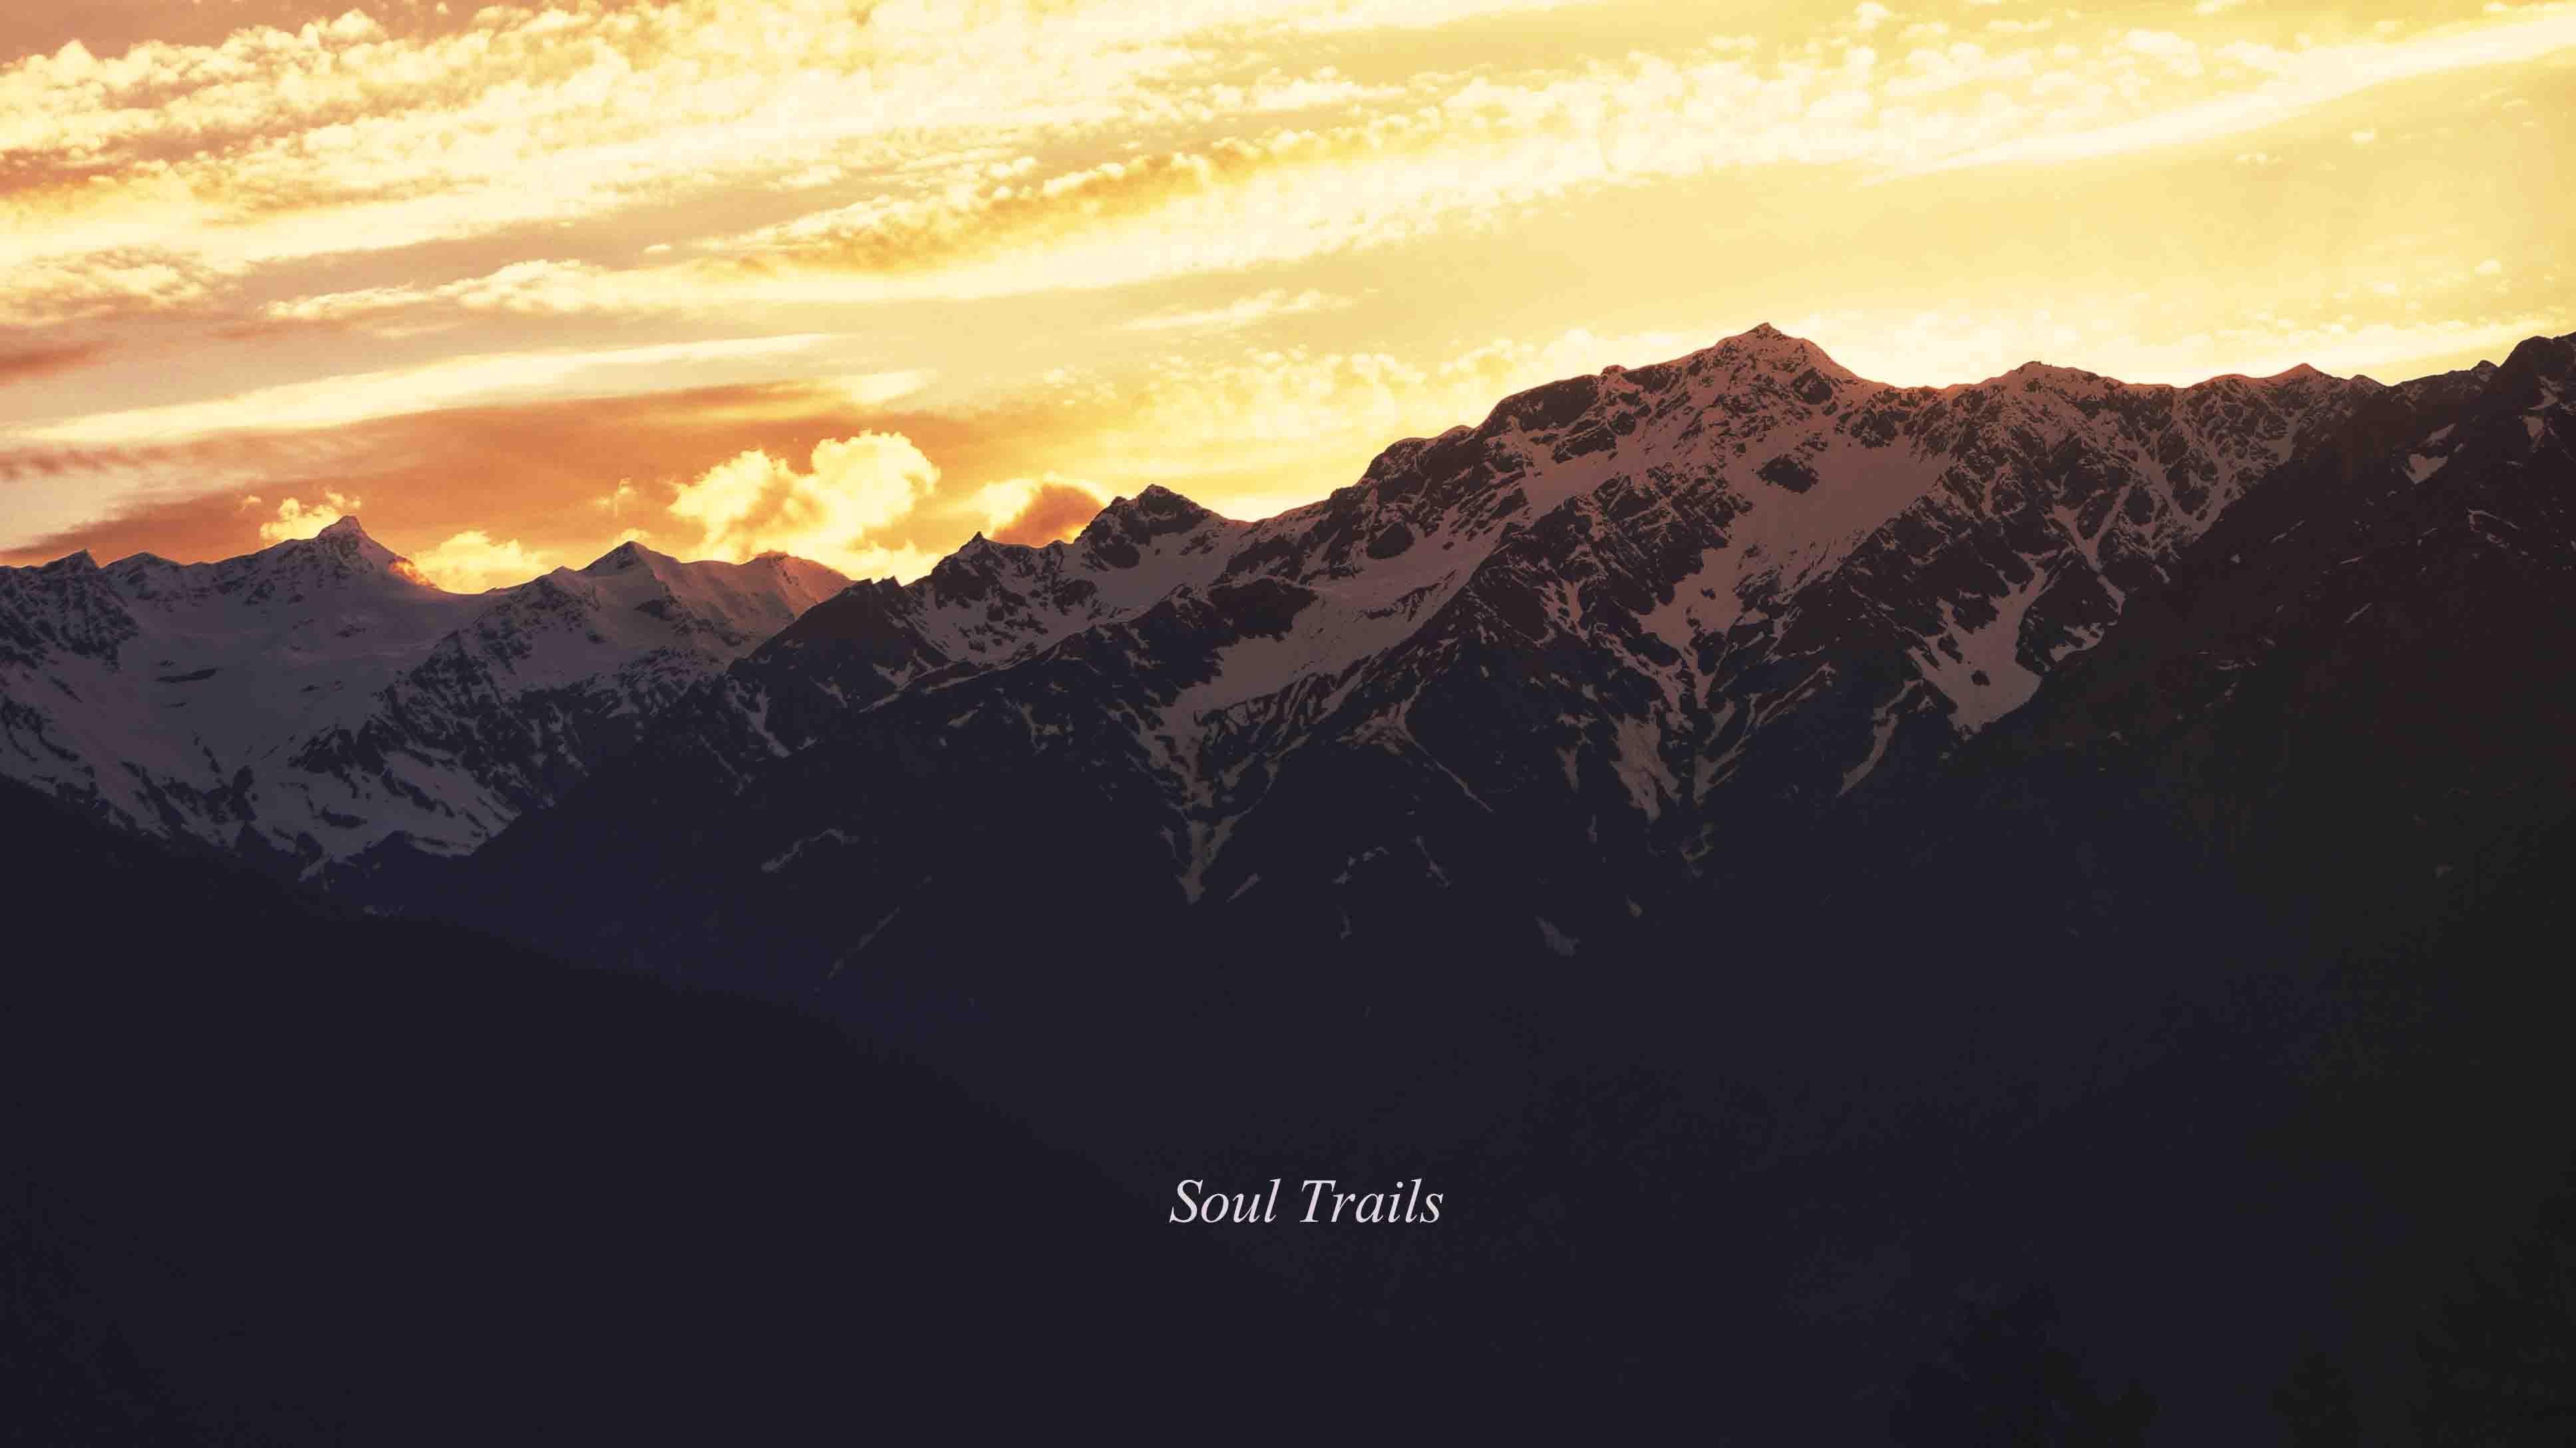 Sethan, Manali, Himachal Pradesh Soul Trails